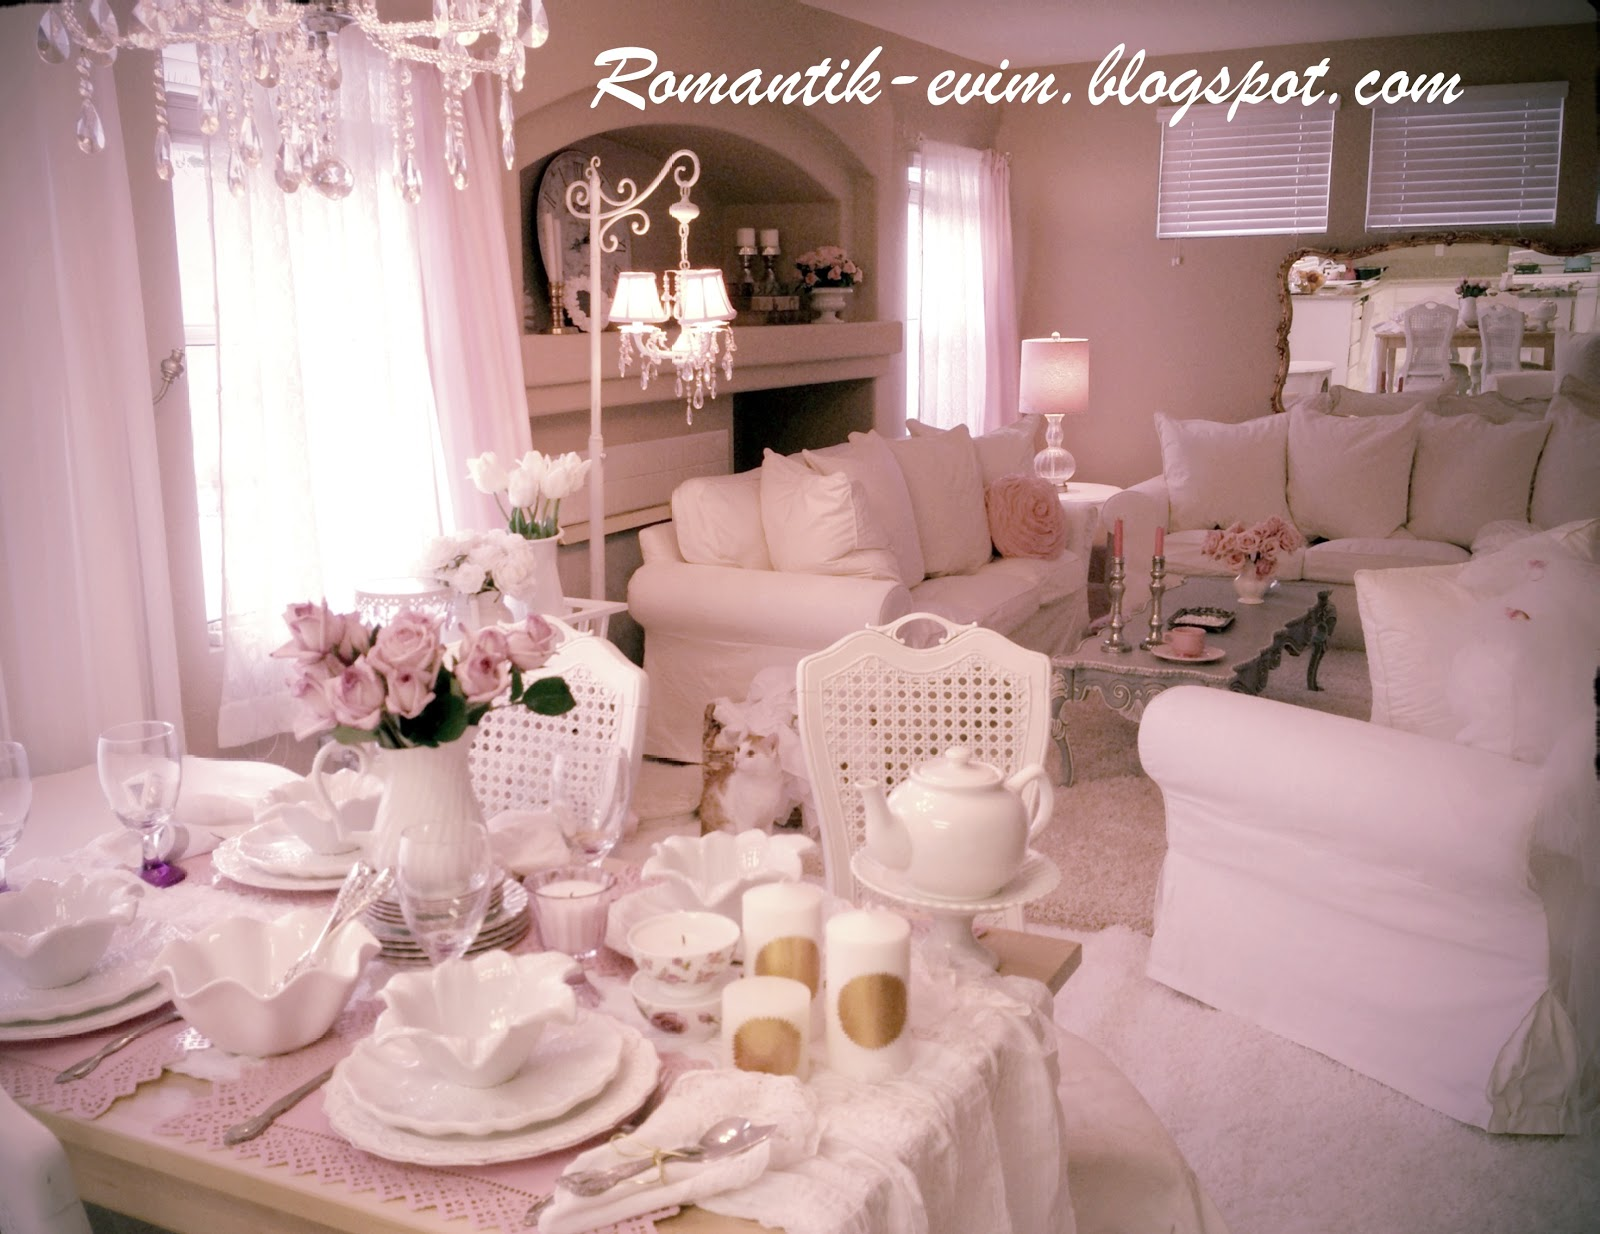 1000 images about blogs tours on pinterest romantic. Black Bedroom Furniture Sets. Home Design Ideas